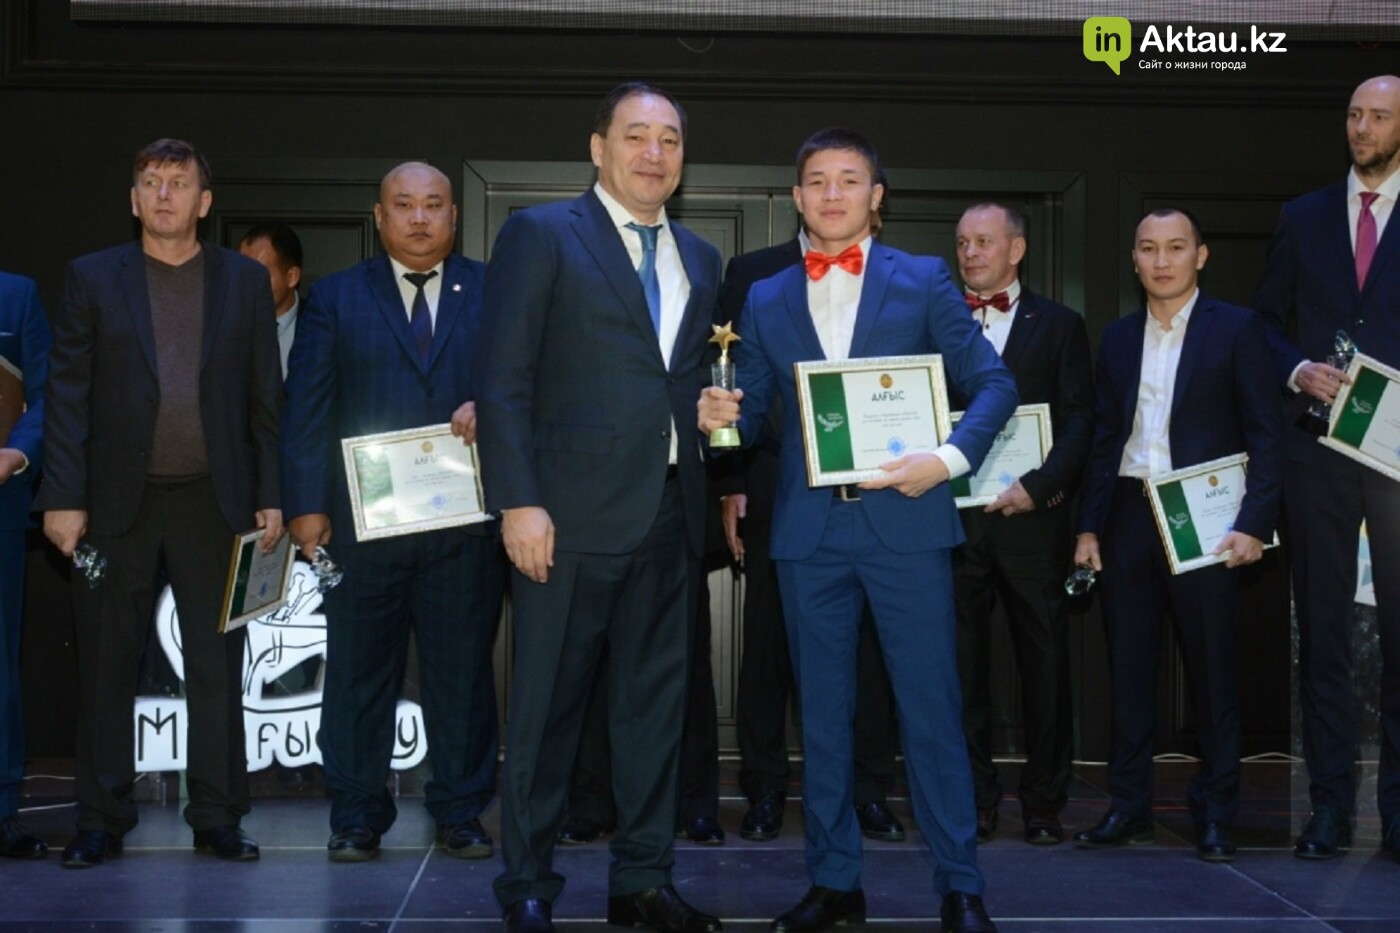 Награды за вклад в развитие спорта получили более 70 мангистаусцев, фото-4